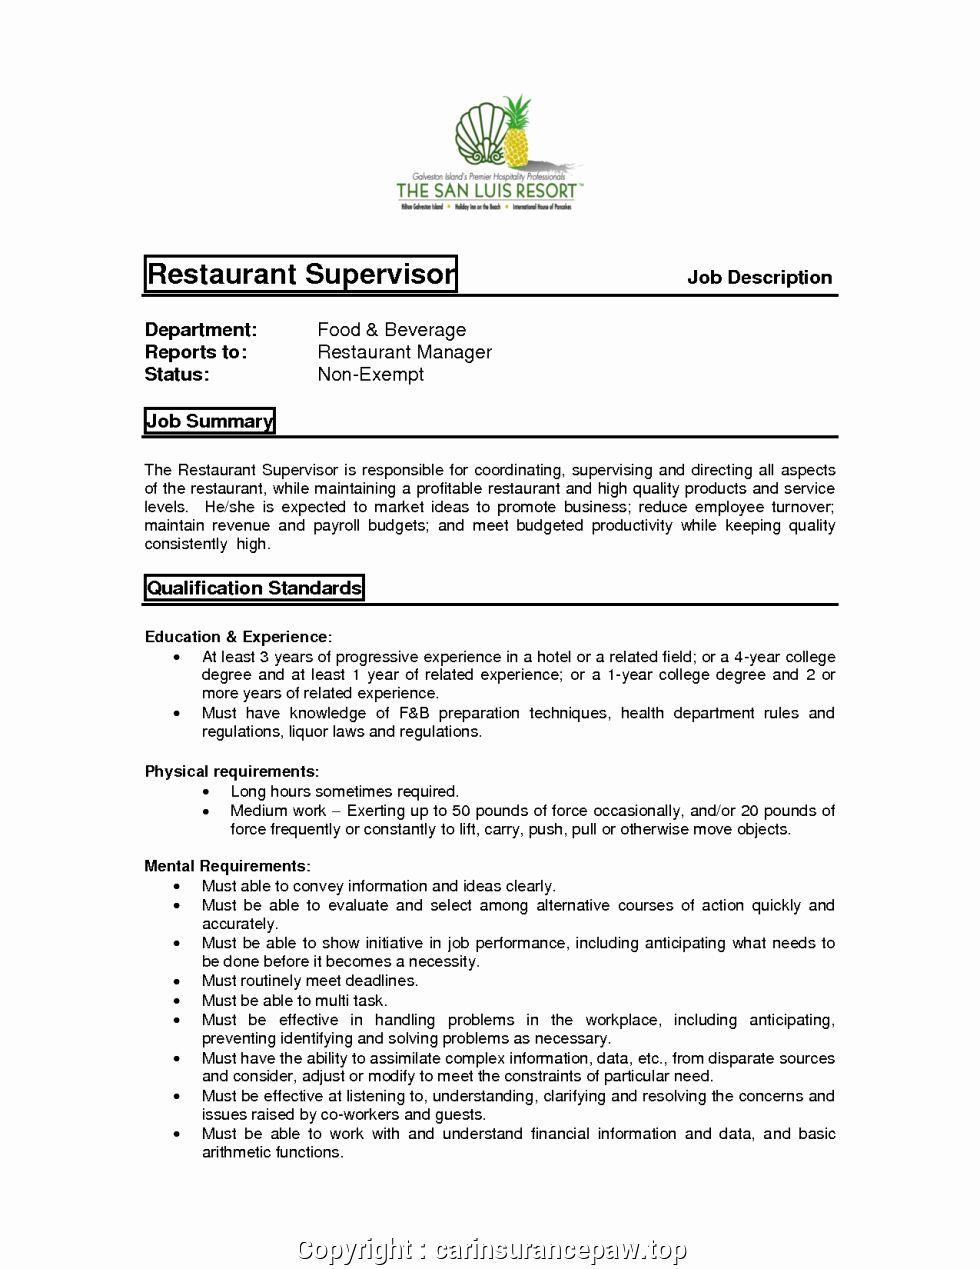 Assistant Manager Resume Description Fresh Print Restaurant Manager Requirements Resume Restaurant Manager Resume Job Description Job Resume